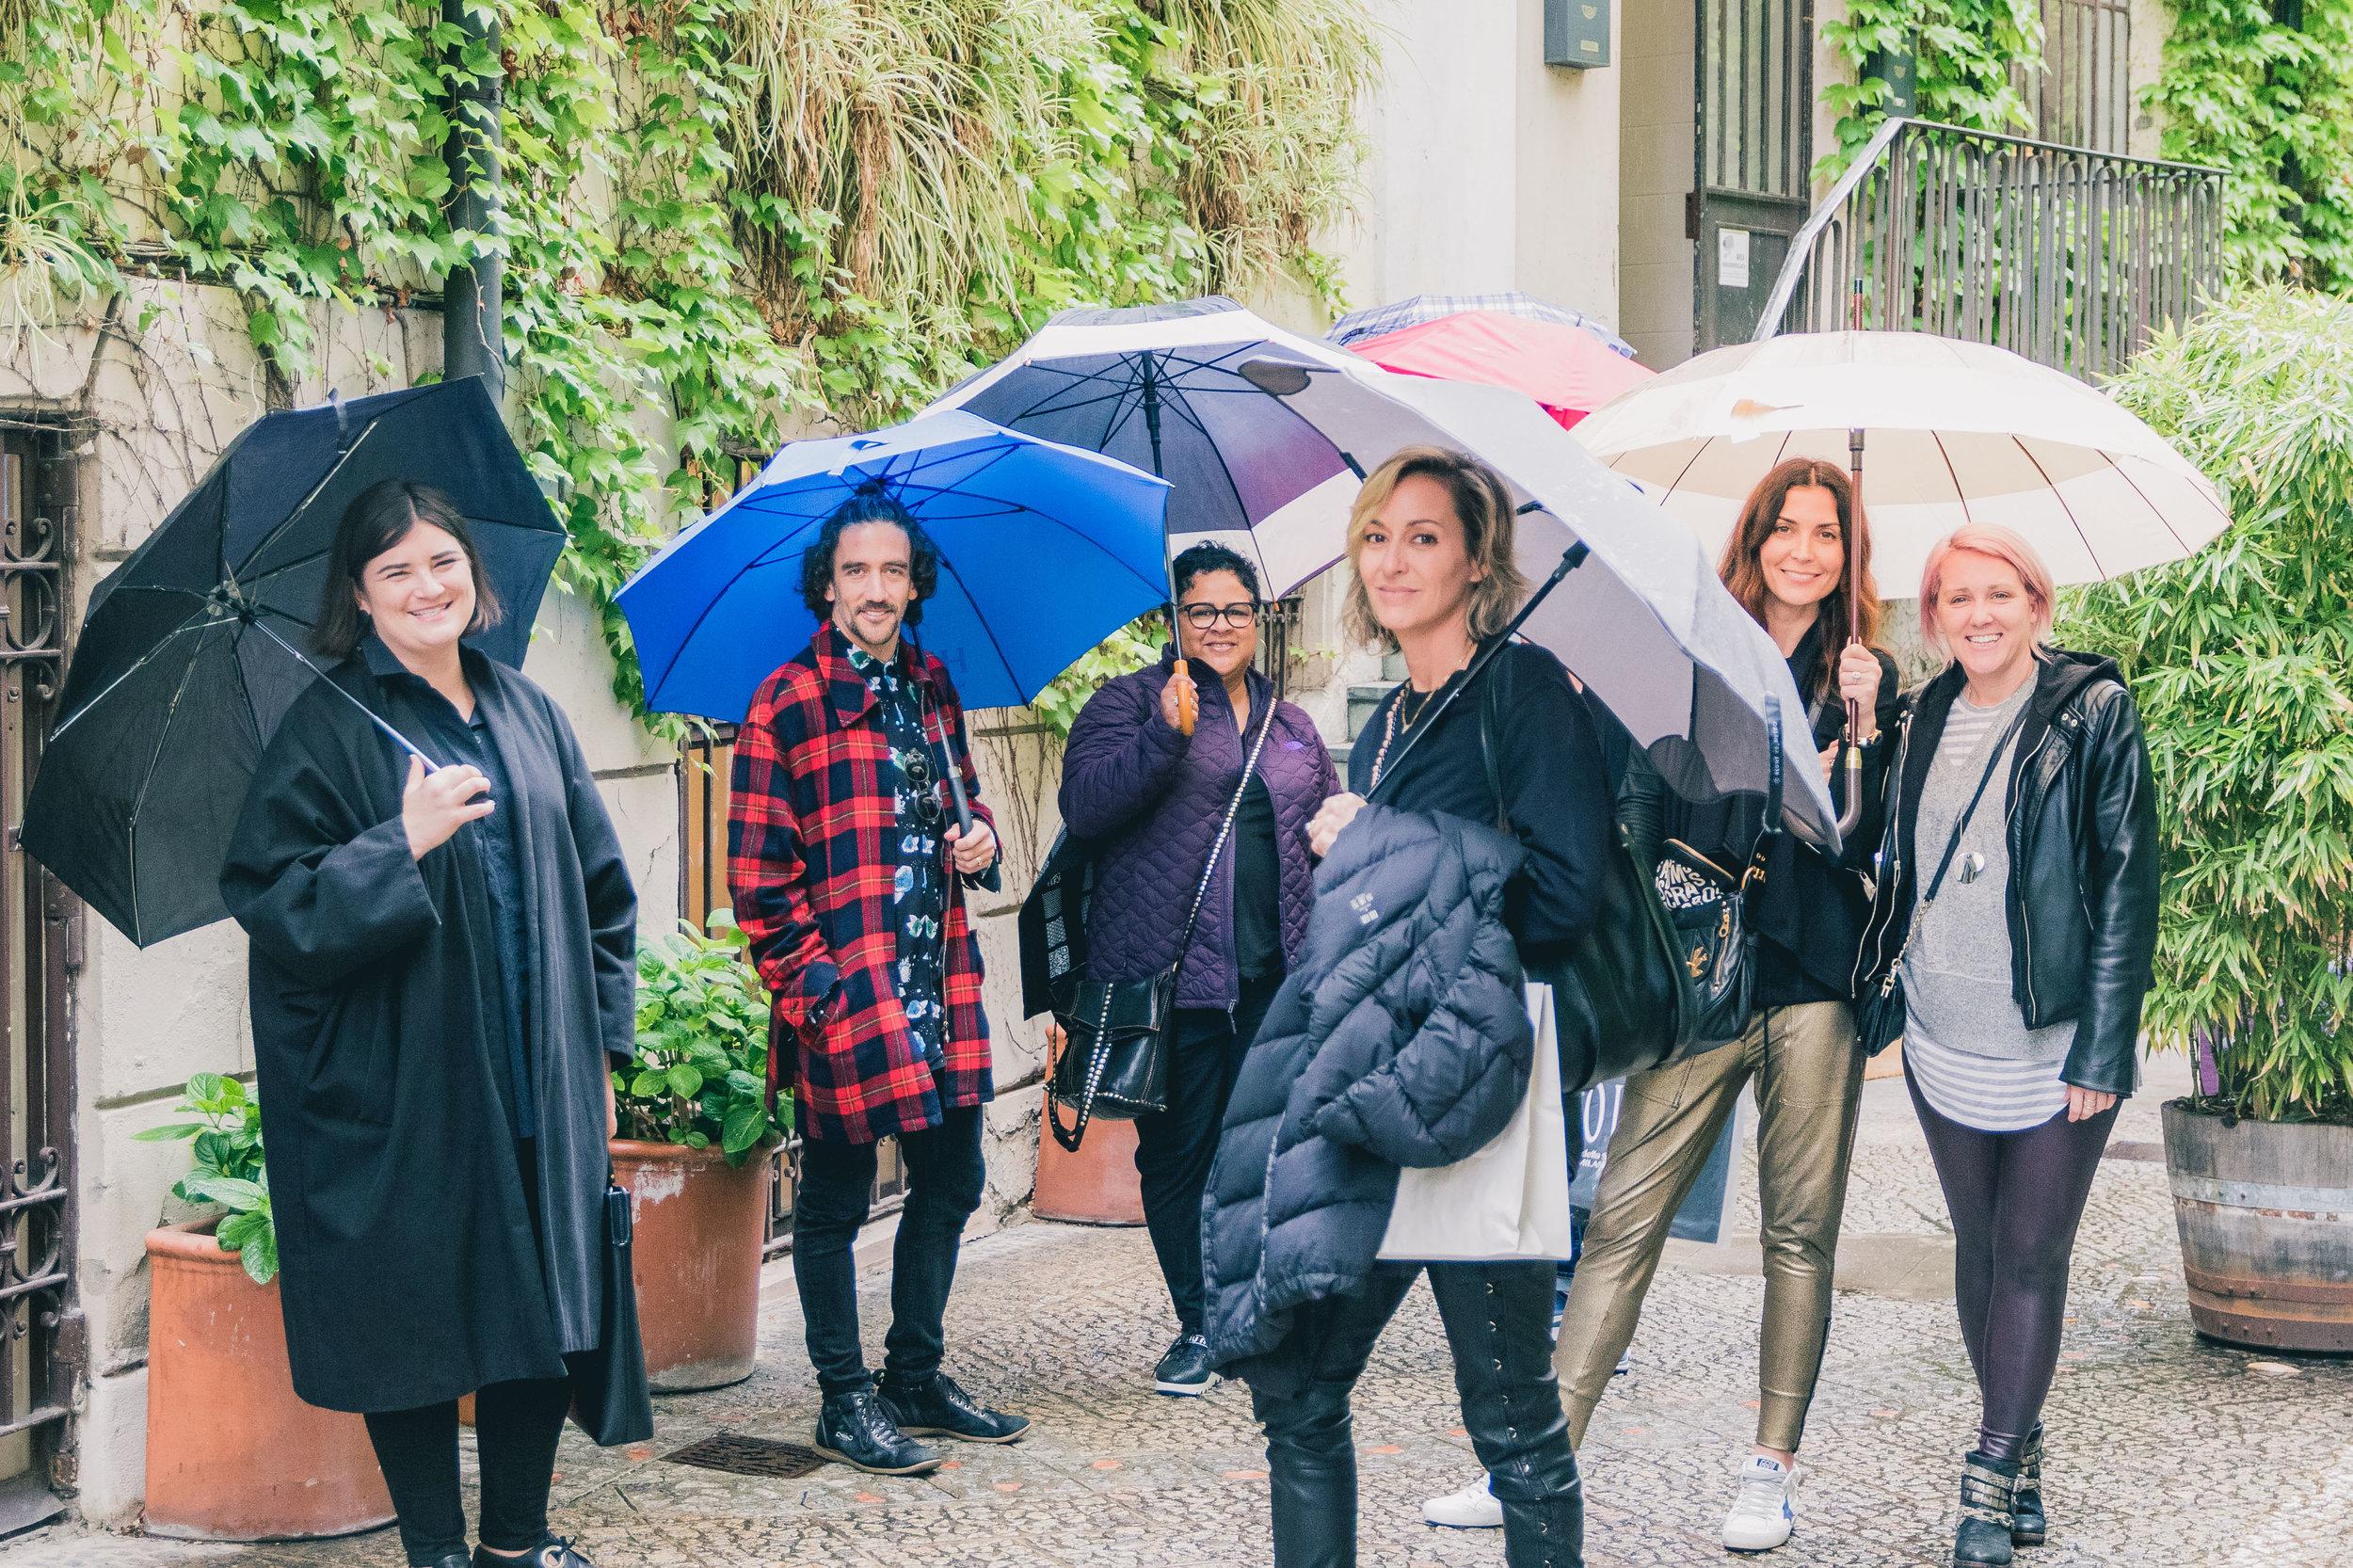 Fearless creatives (from left to right): Beks Opperman, Matthew Rosenberg, Caren Rideau, Ginna Christensen, Joanna Parol and Tracy Hiner